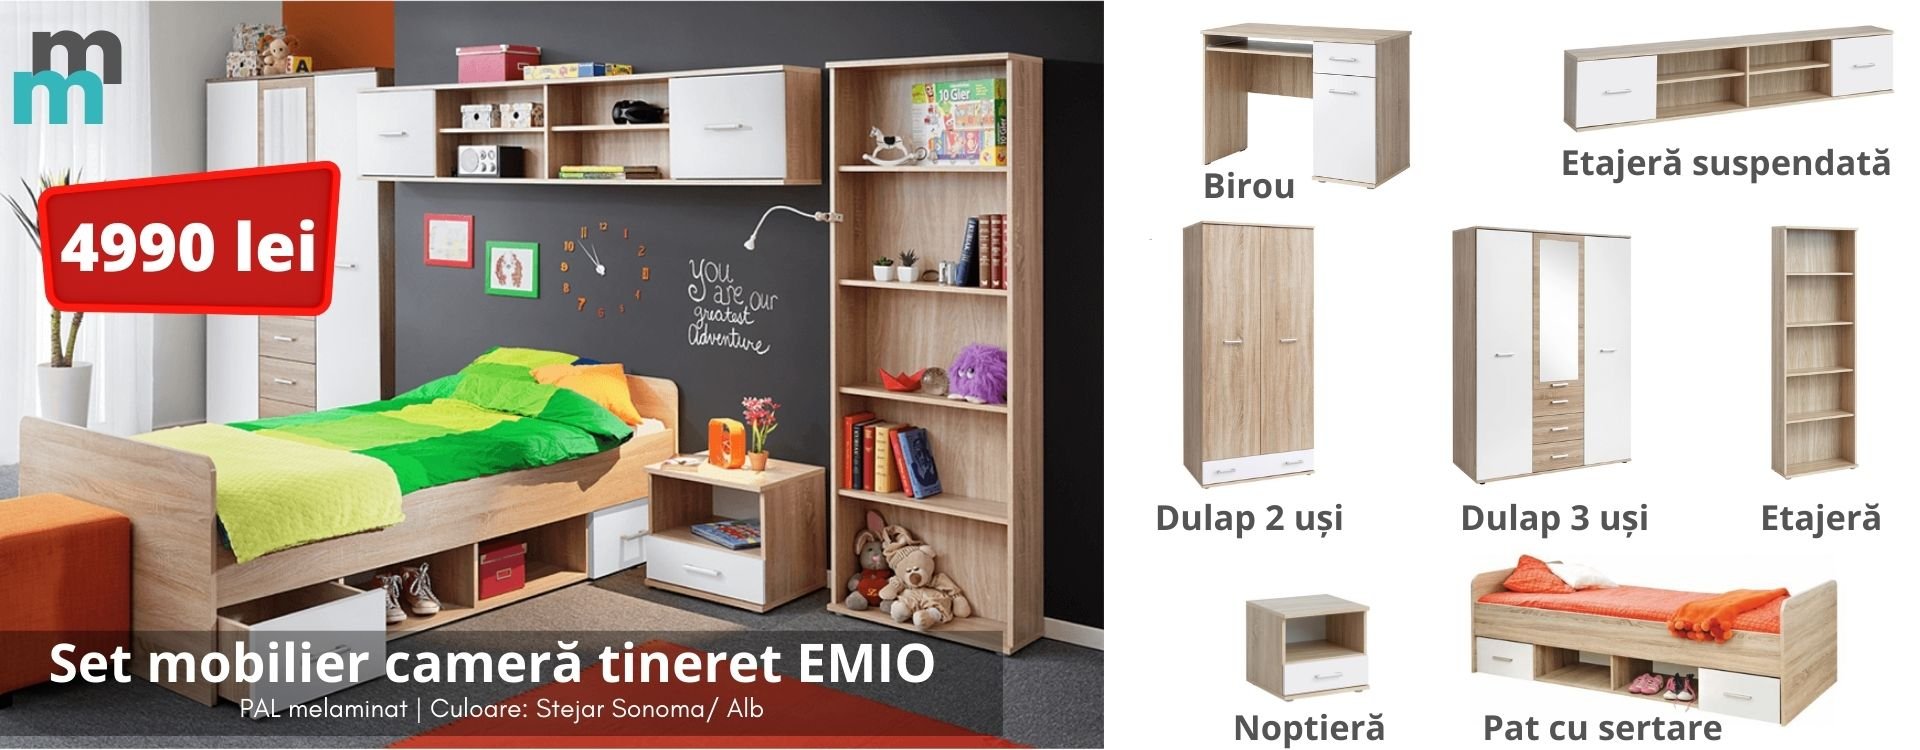 Set mobilier camera tineret EMIO